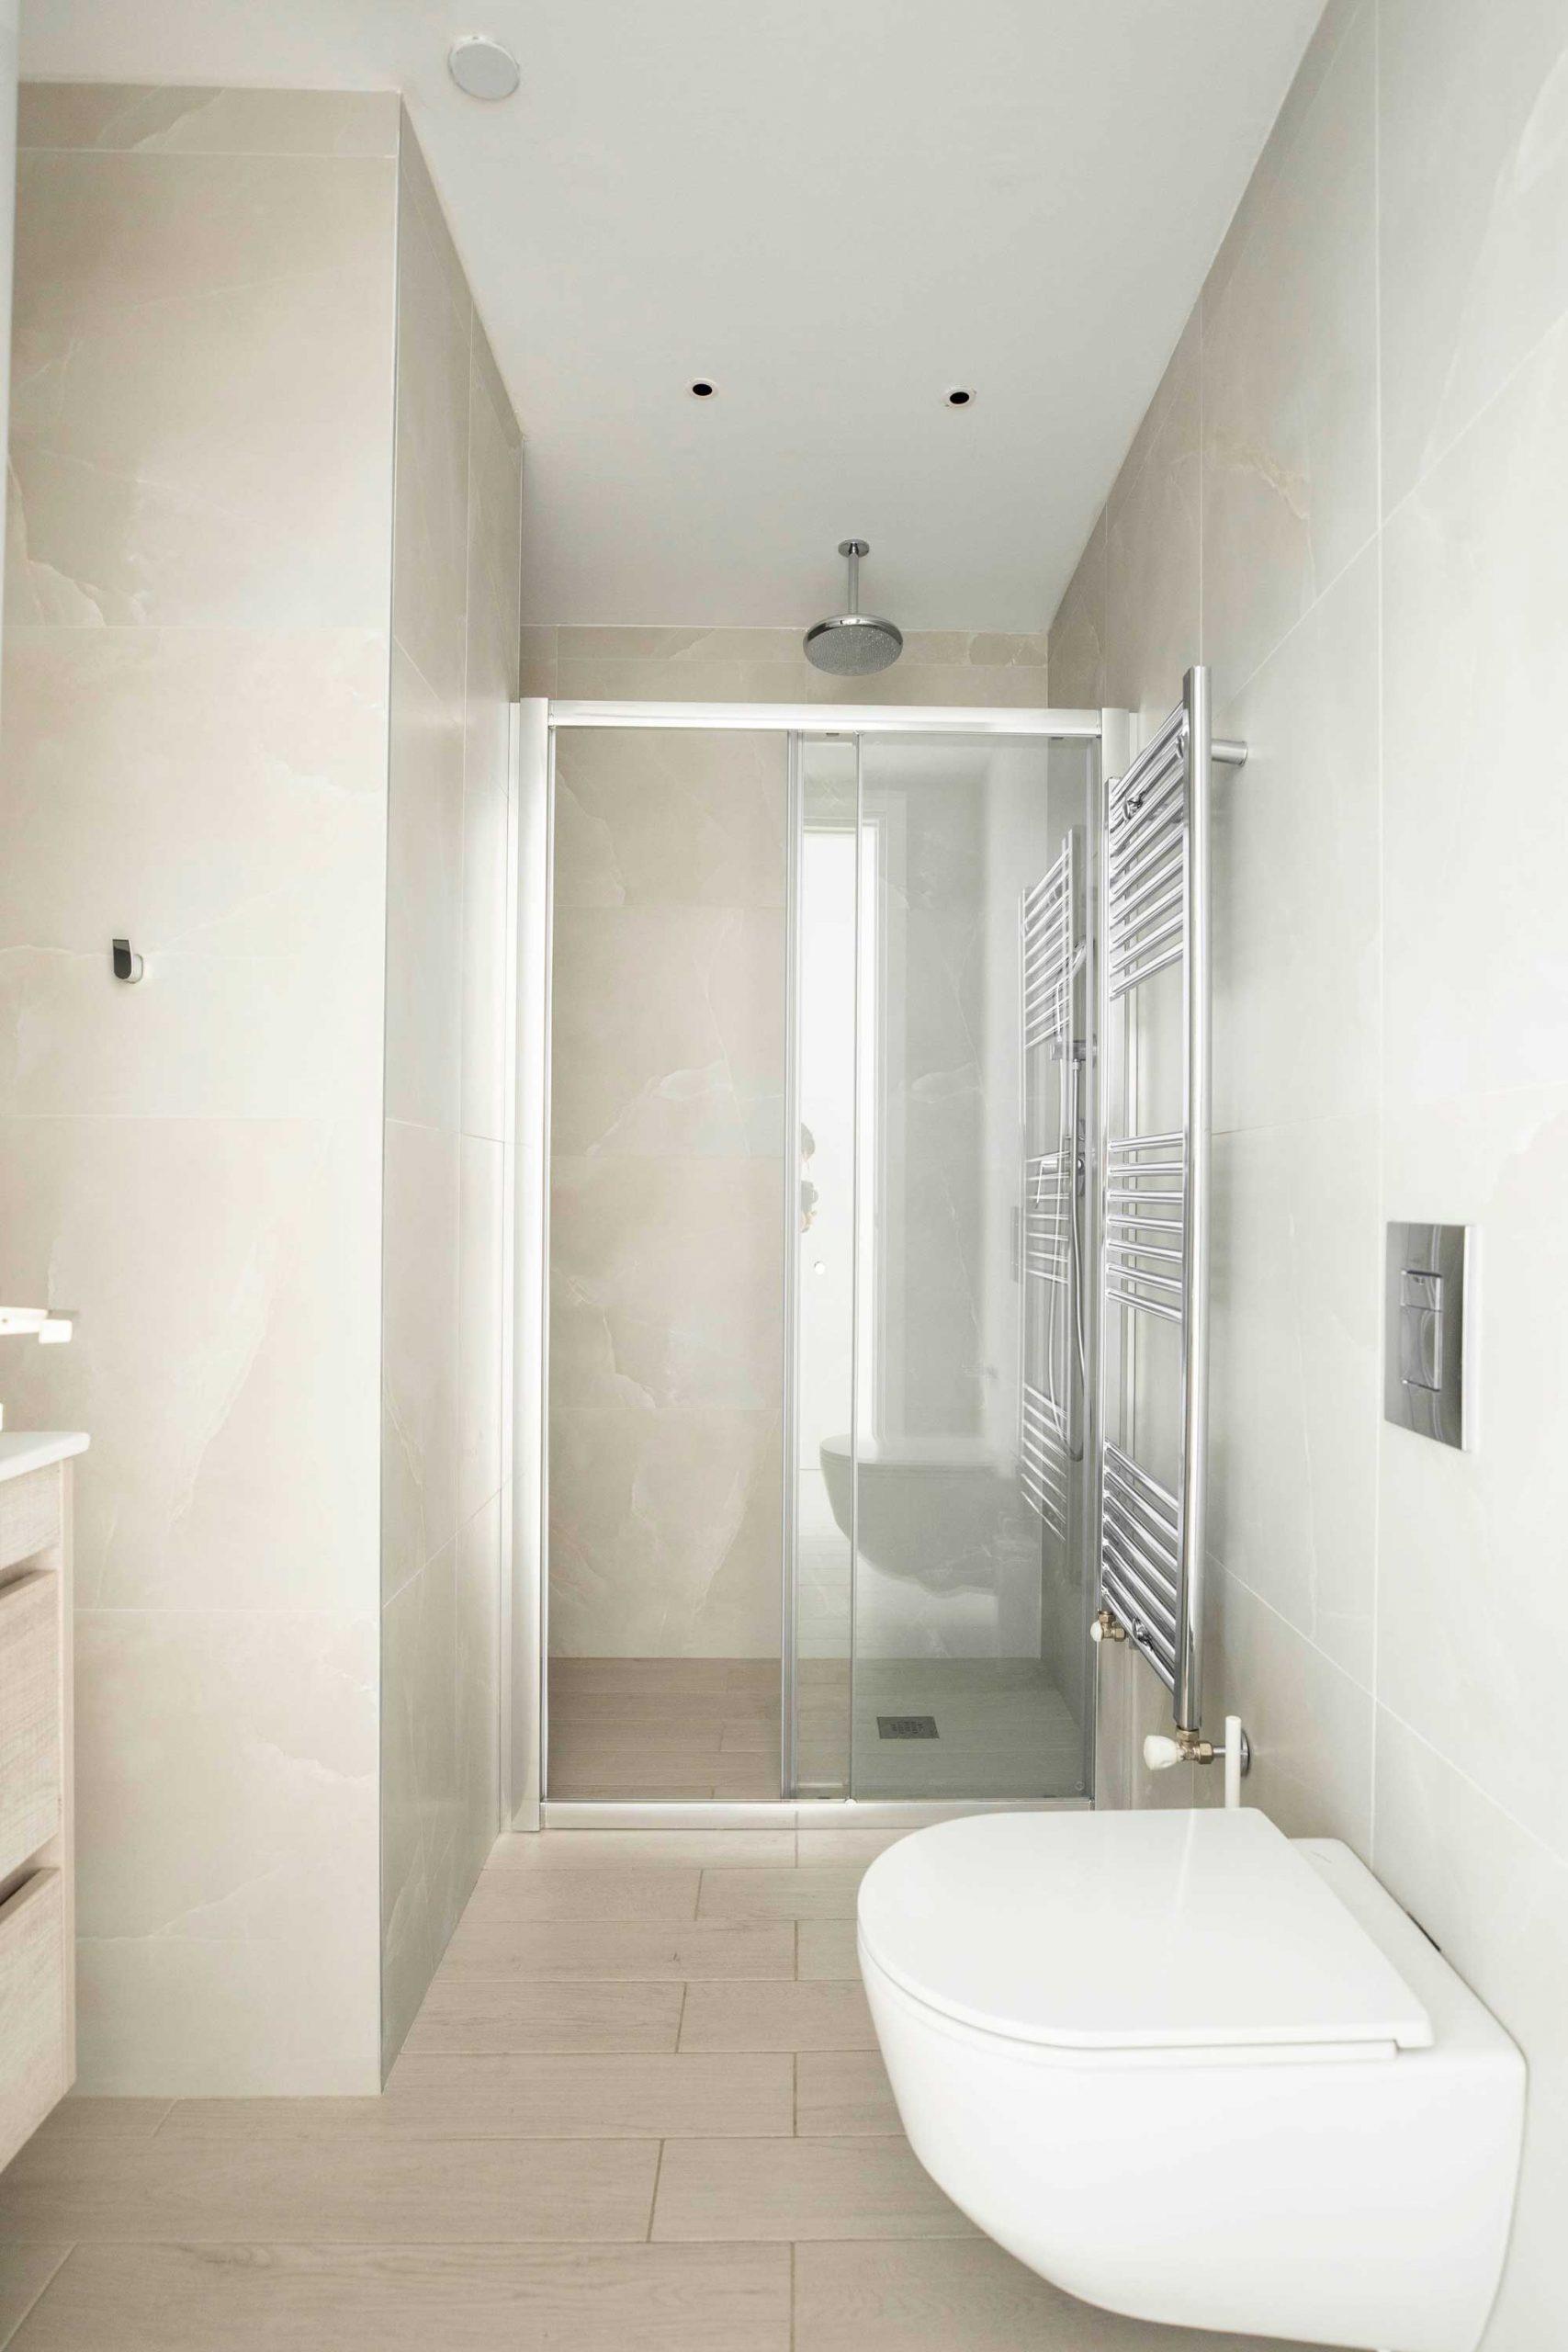 360 Nicosia – Apartment 1505